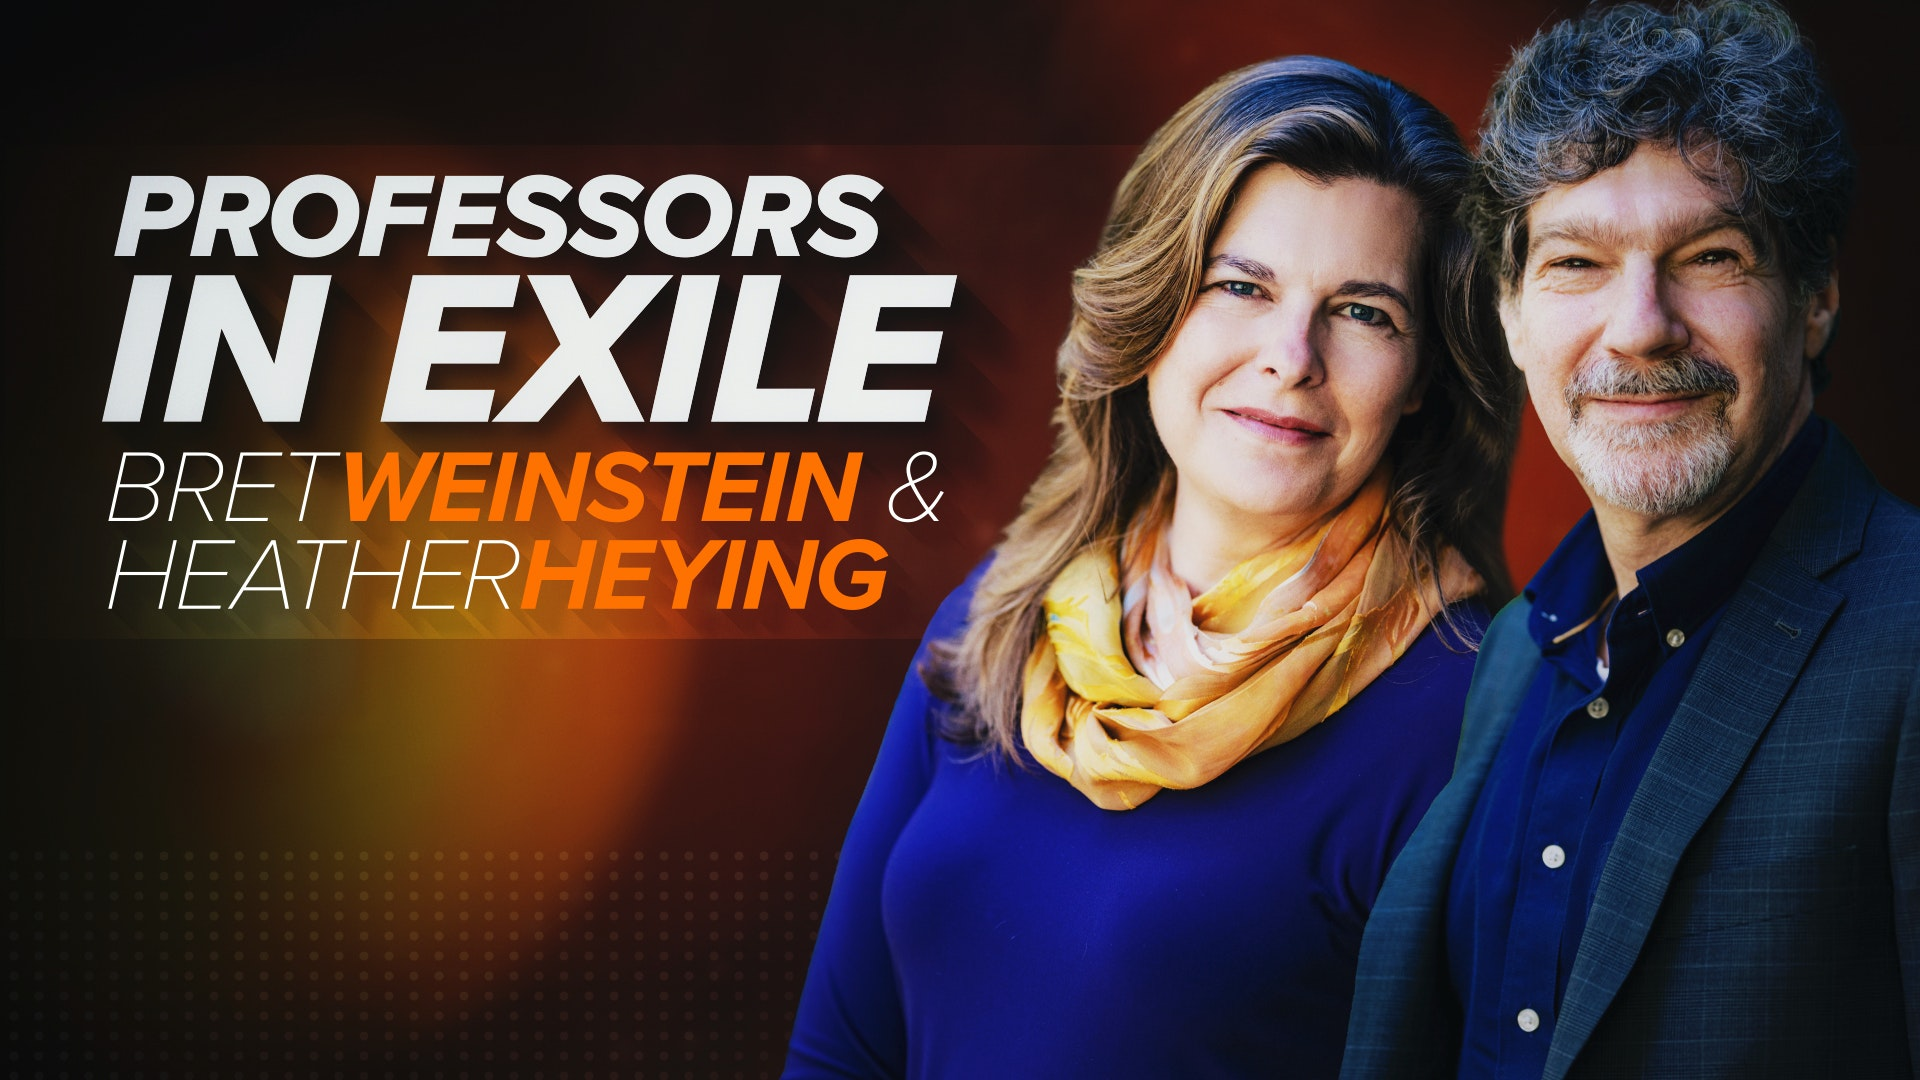 Ep. 118 - Brett Weinstein and Heather Heying